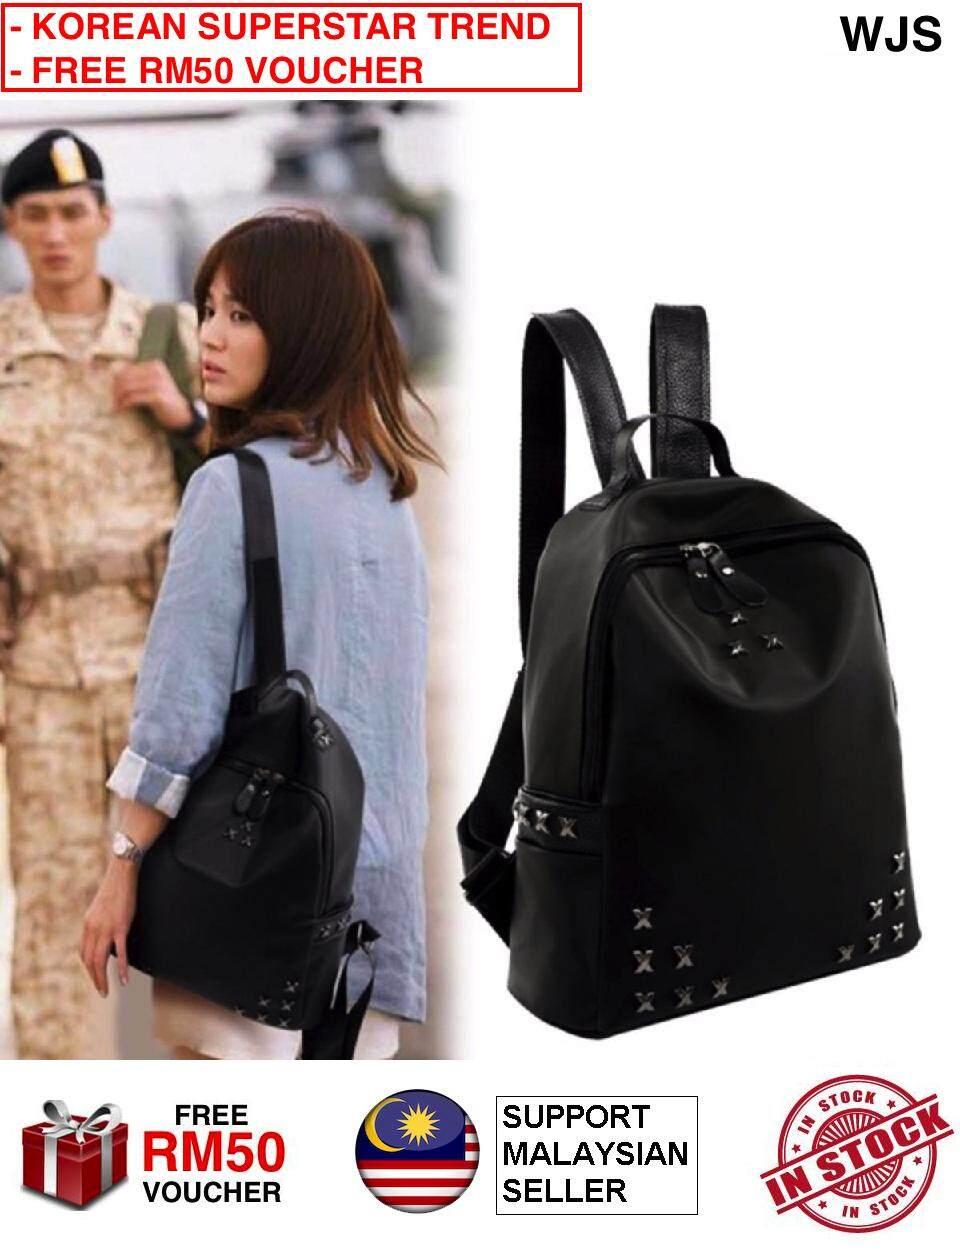 (KOREAN SUPERSTAR TREND) WJS Premium Quality Korean Fashion DESCENDANTS OF THE SUN Women Backpack Fashion Rivets Shoulder Bag Bag Pack Korea Fashion Kstyle Kpop Kdrama BLACK (FREE RM50 VOUCHER)